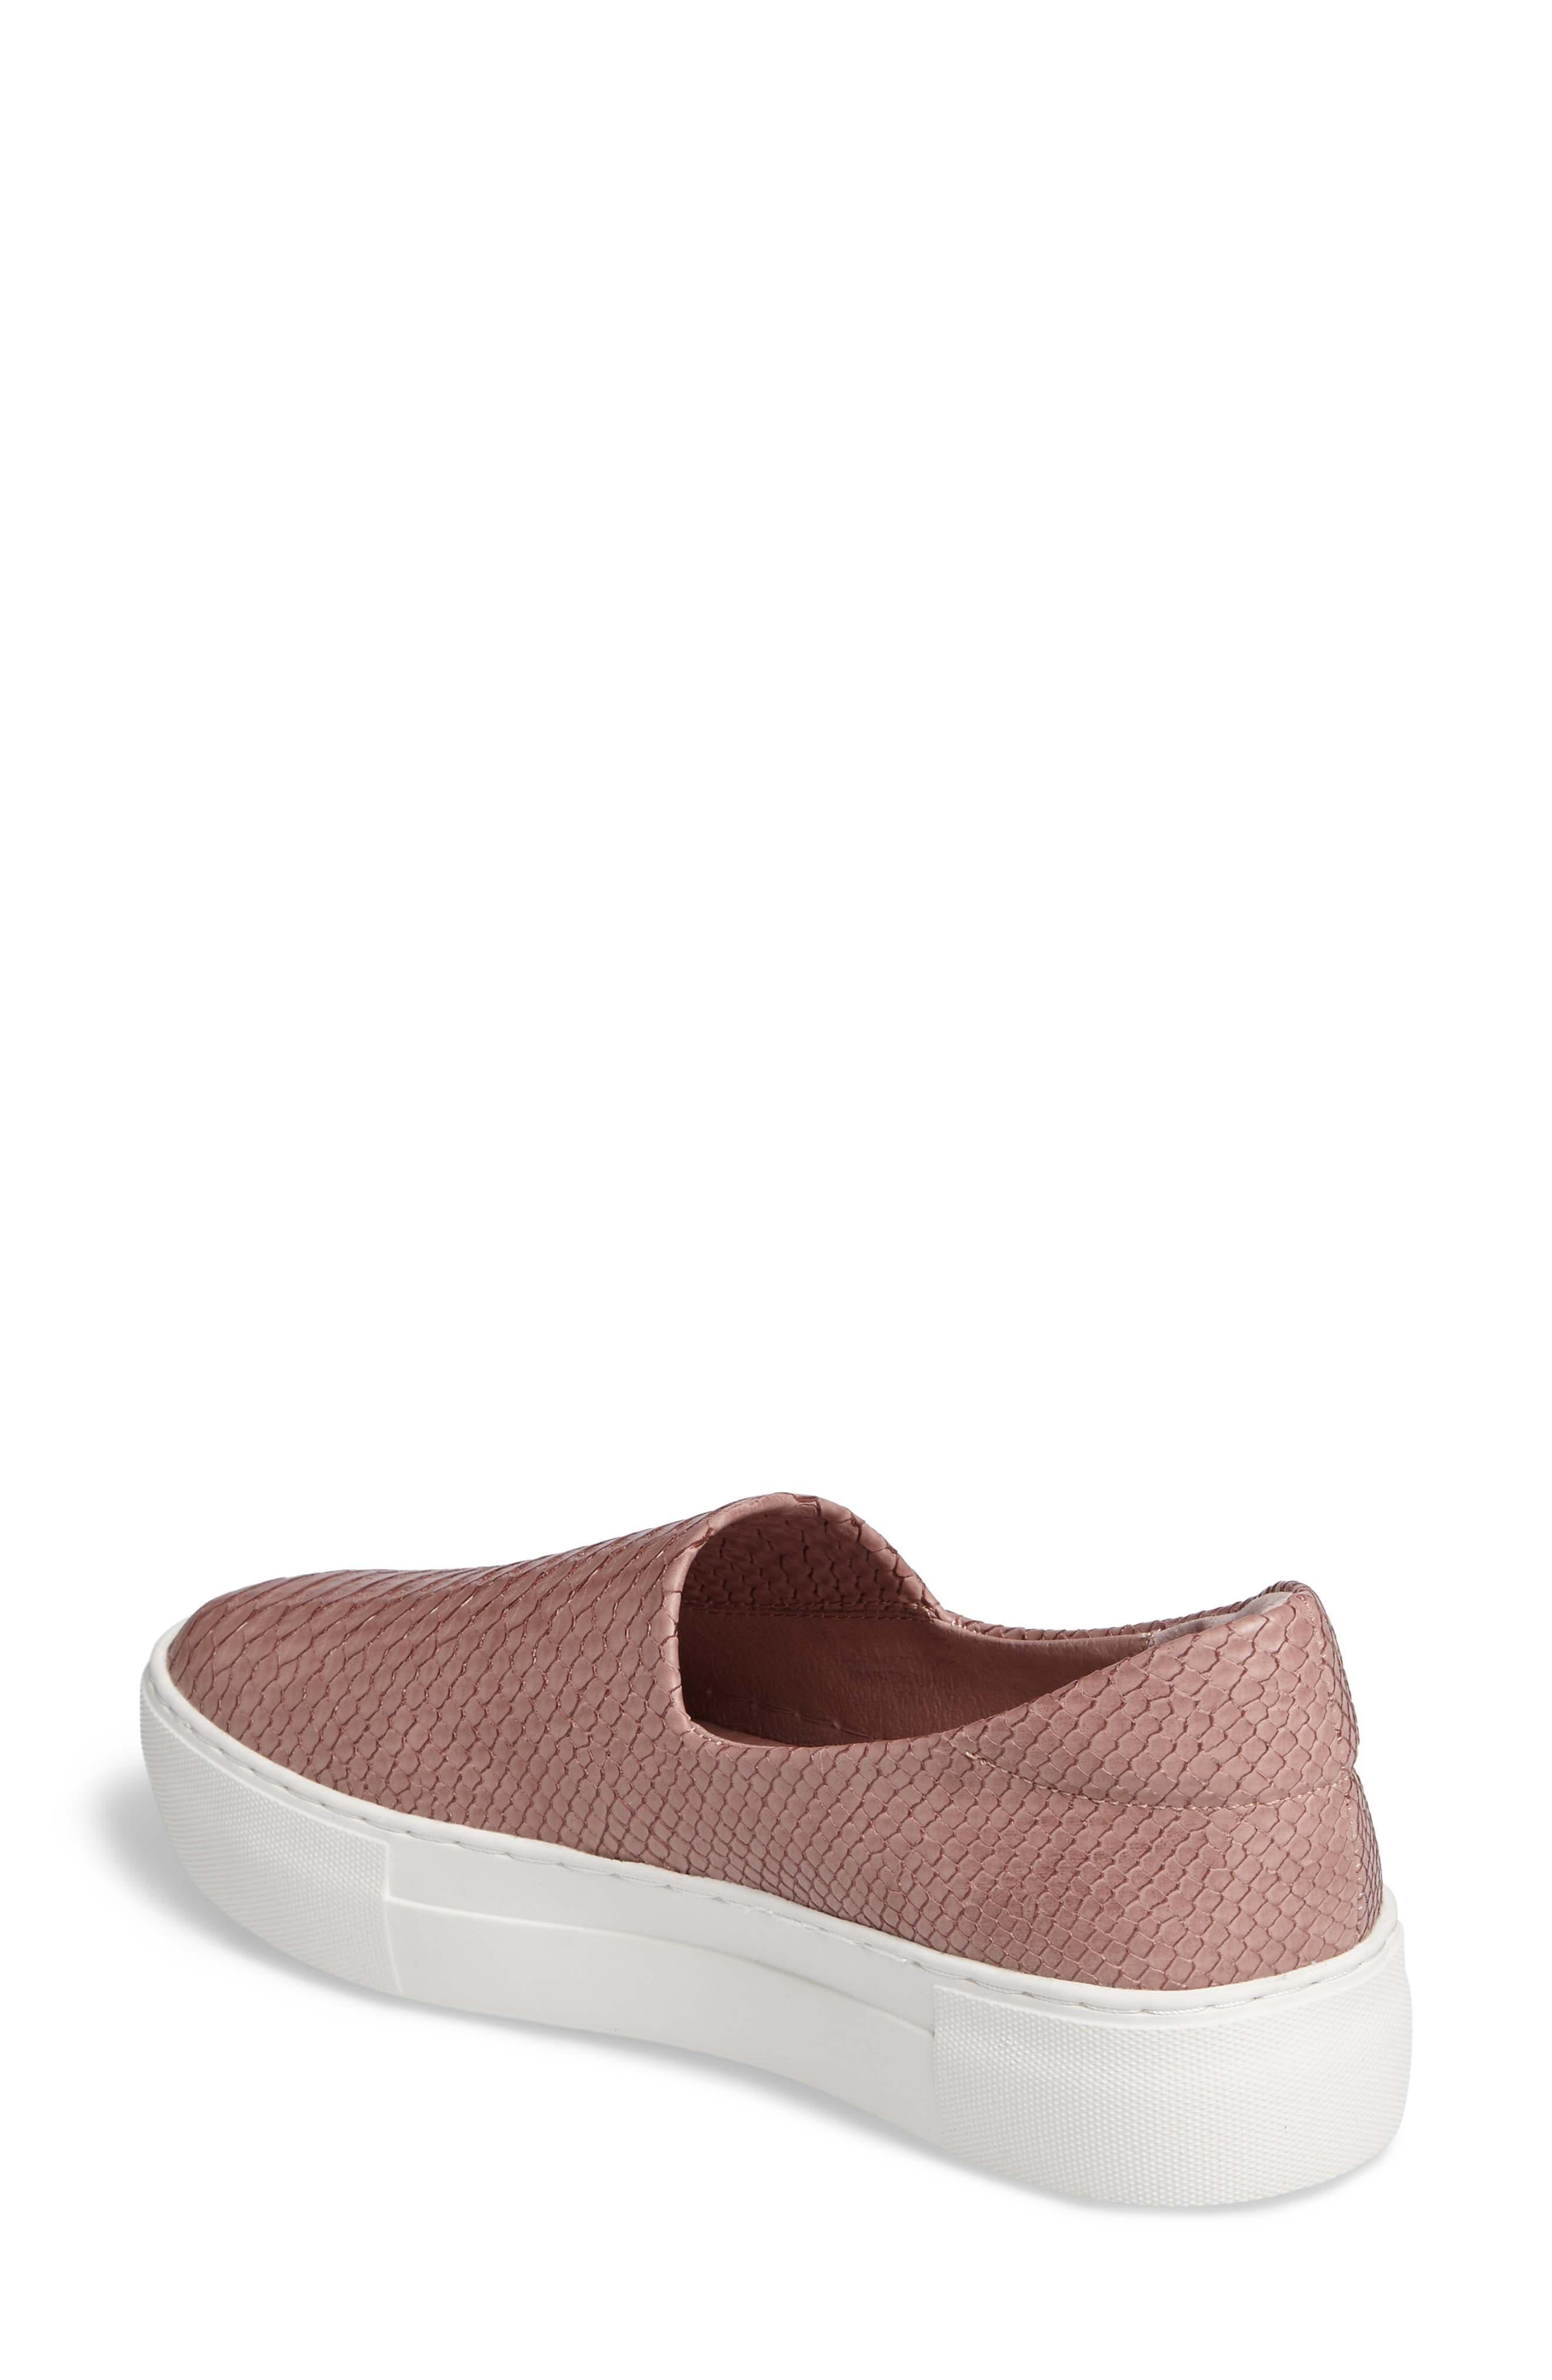 Alternate Image 2  - JSlides 'Ariana' Platform Sneaker (Women)